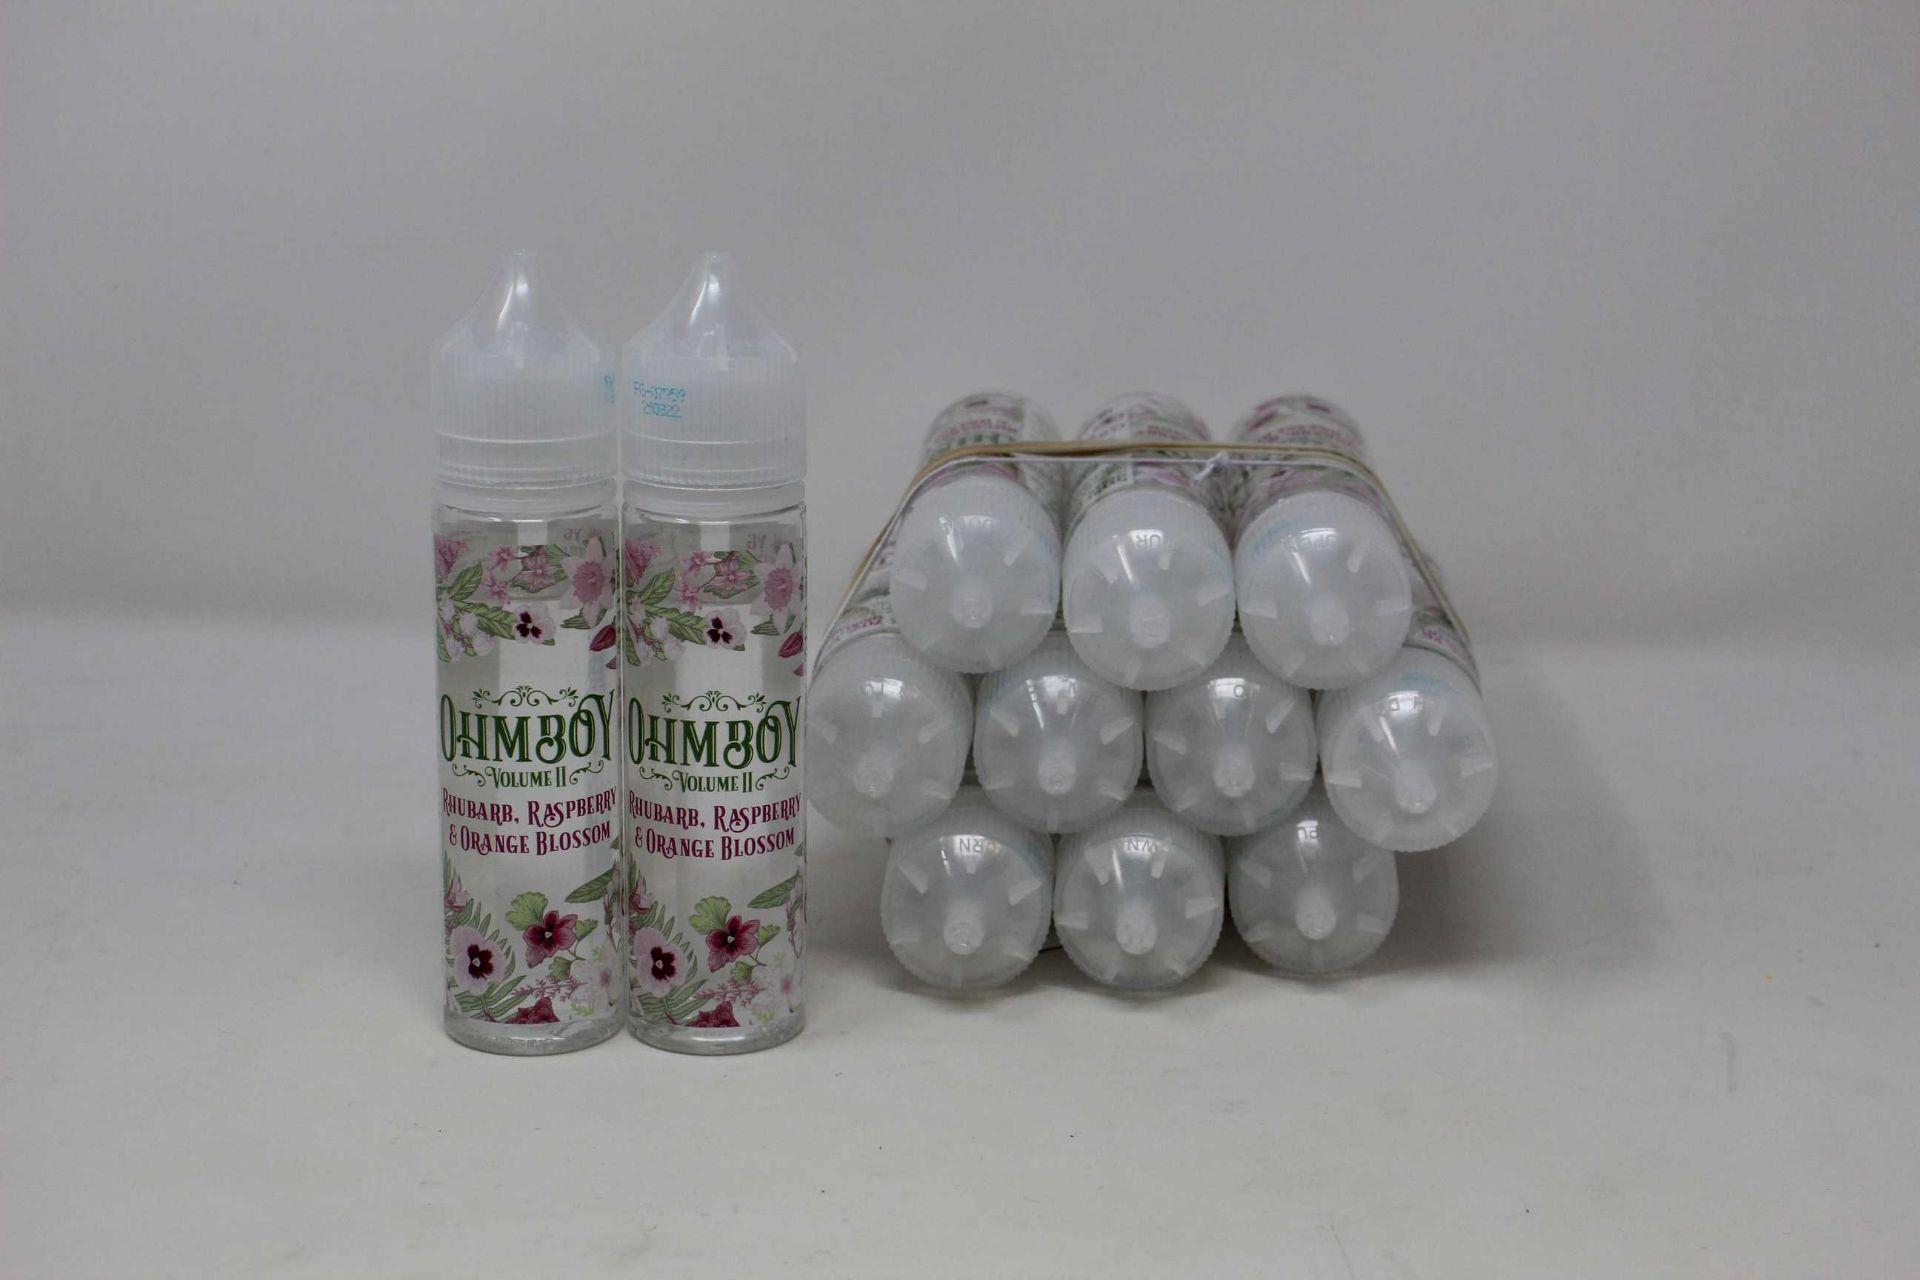 Twelve as new bottles of OHM Boy Volume II Rhubarb, Raspberry & Orange Blossom Botanicals E-Liquid